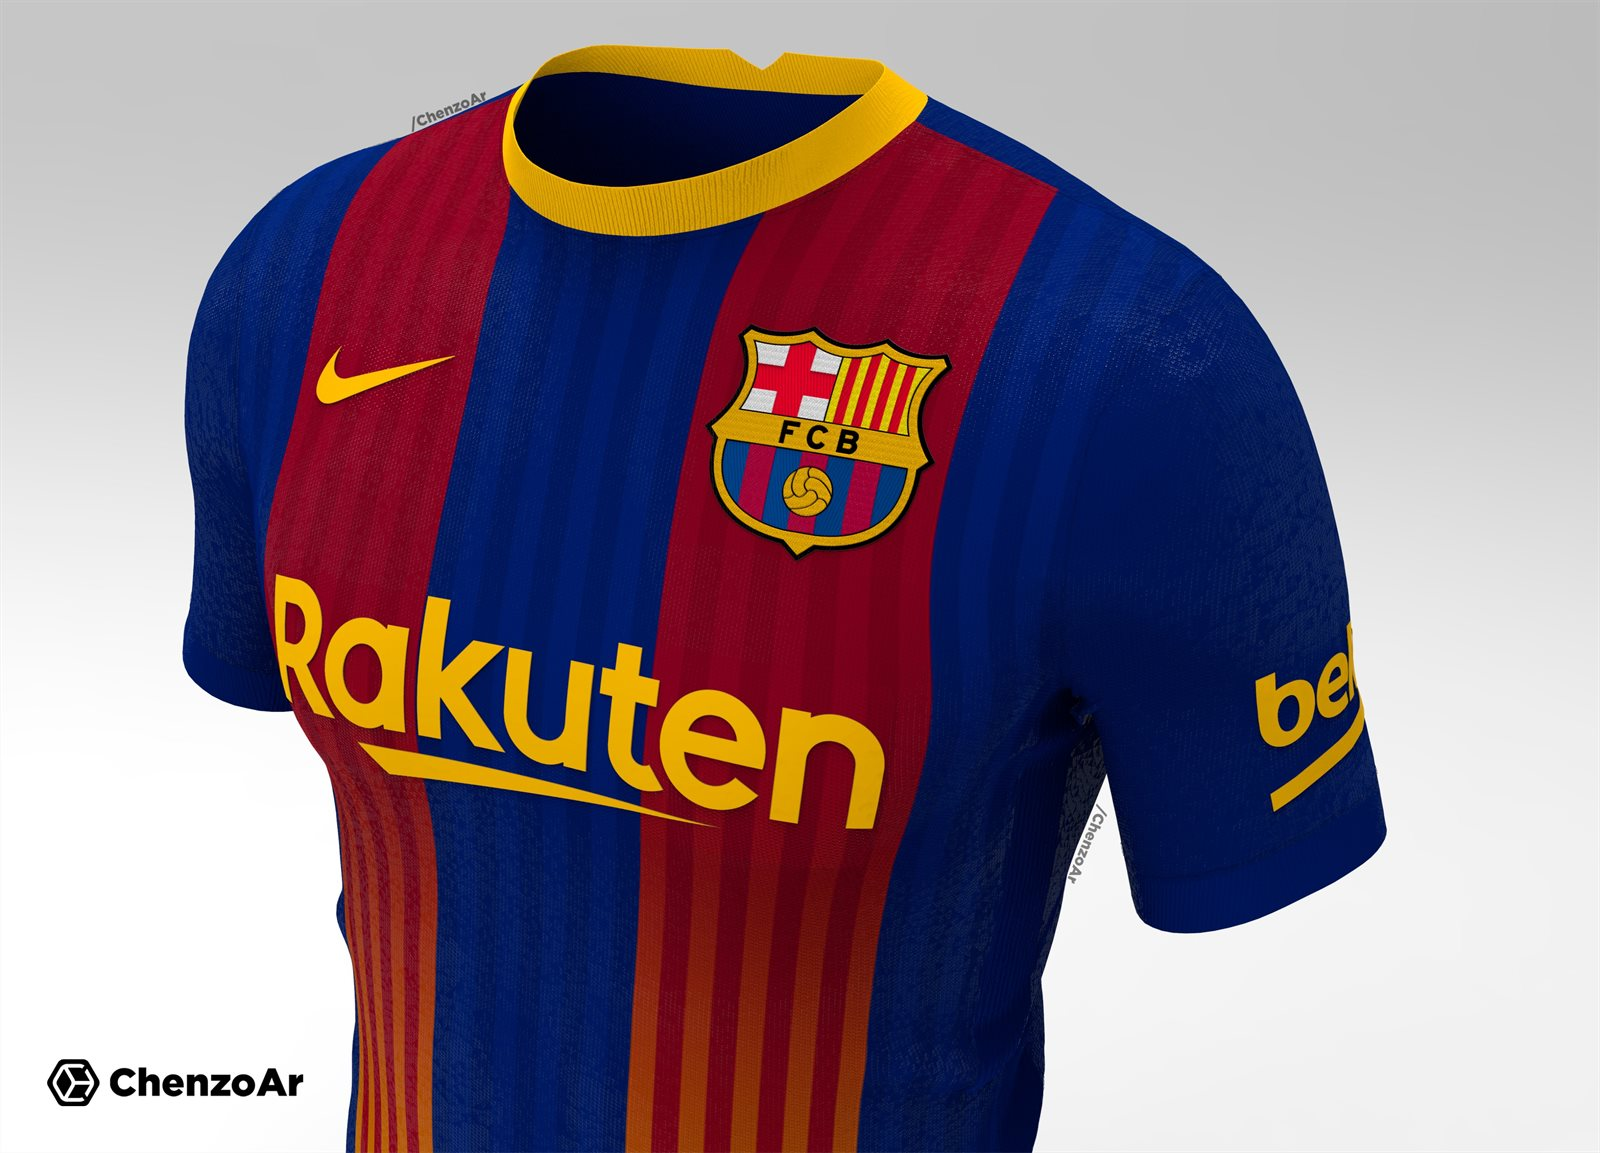 Fc Barcelona New Kits 2021 Dls 20 Logo: FC Barcelona 20-21 Fourth Kit Leaked